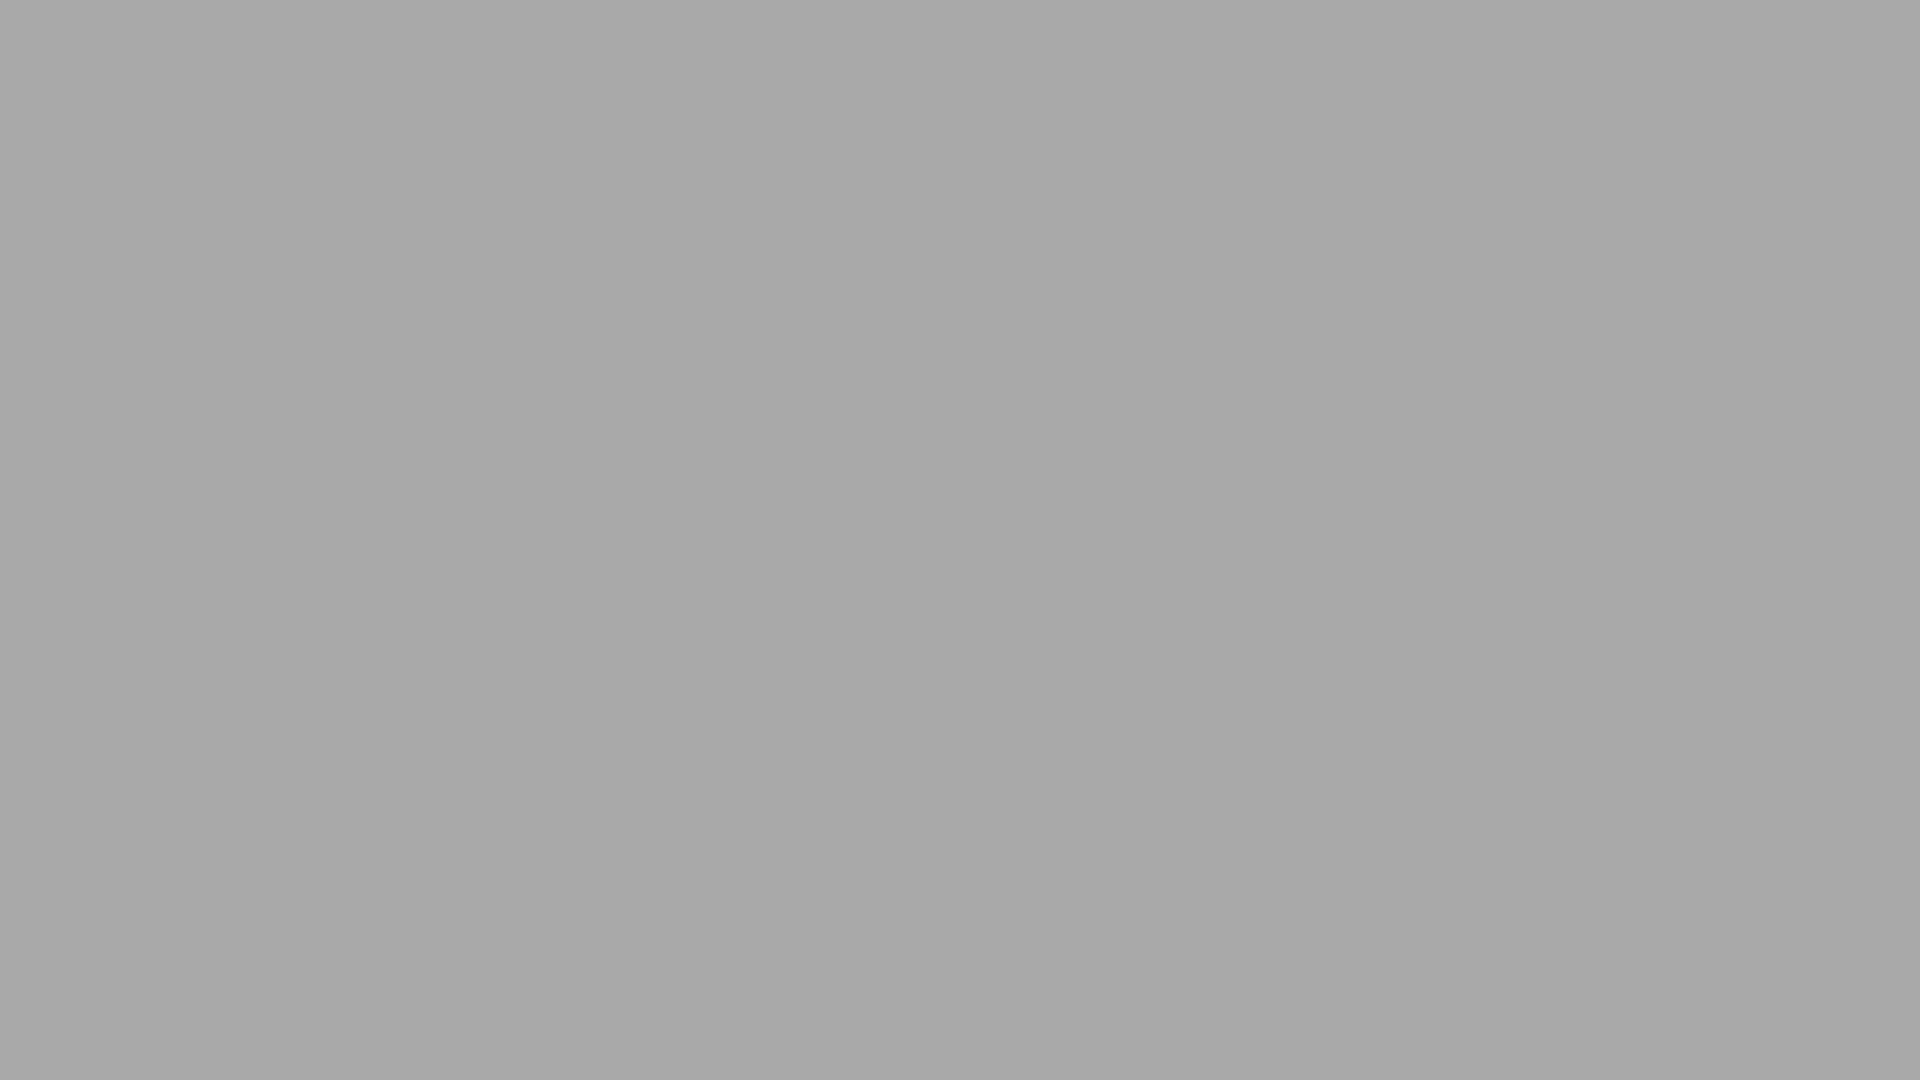 solid grey wallpaper 47194